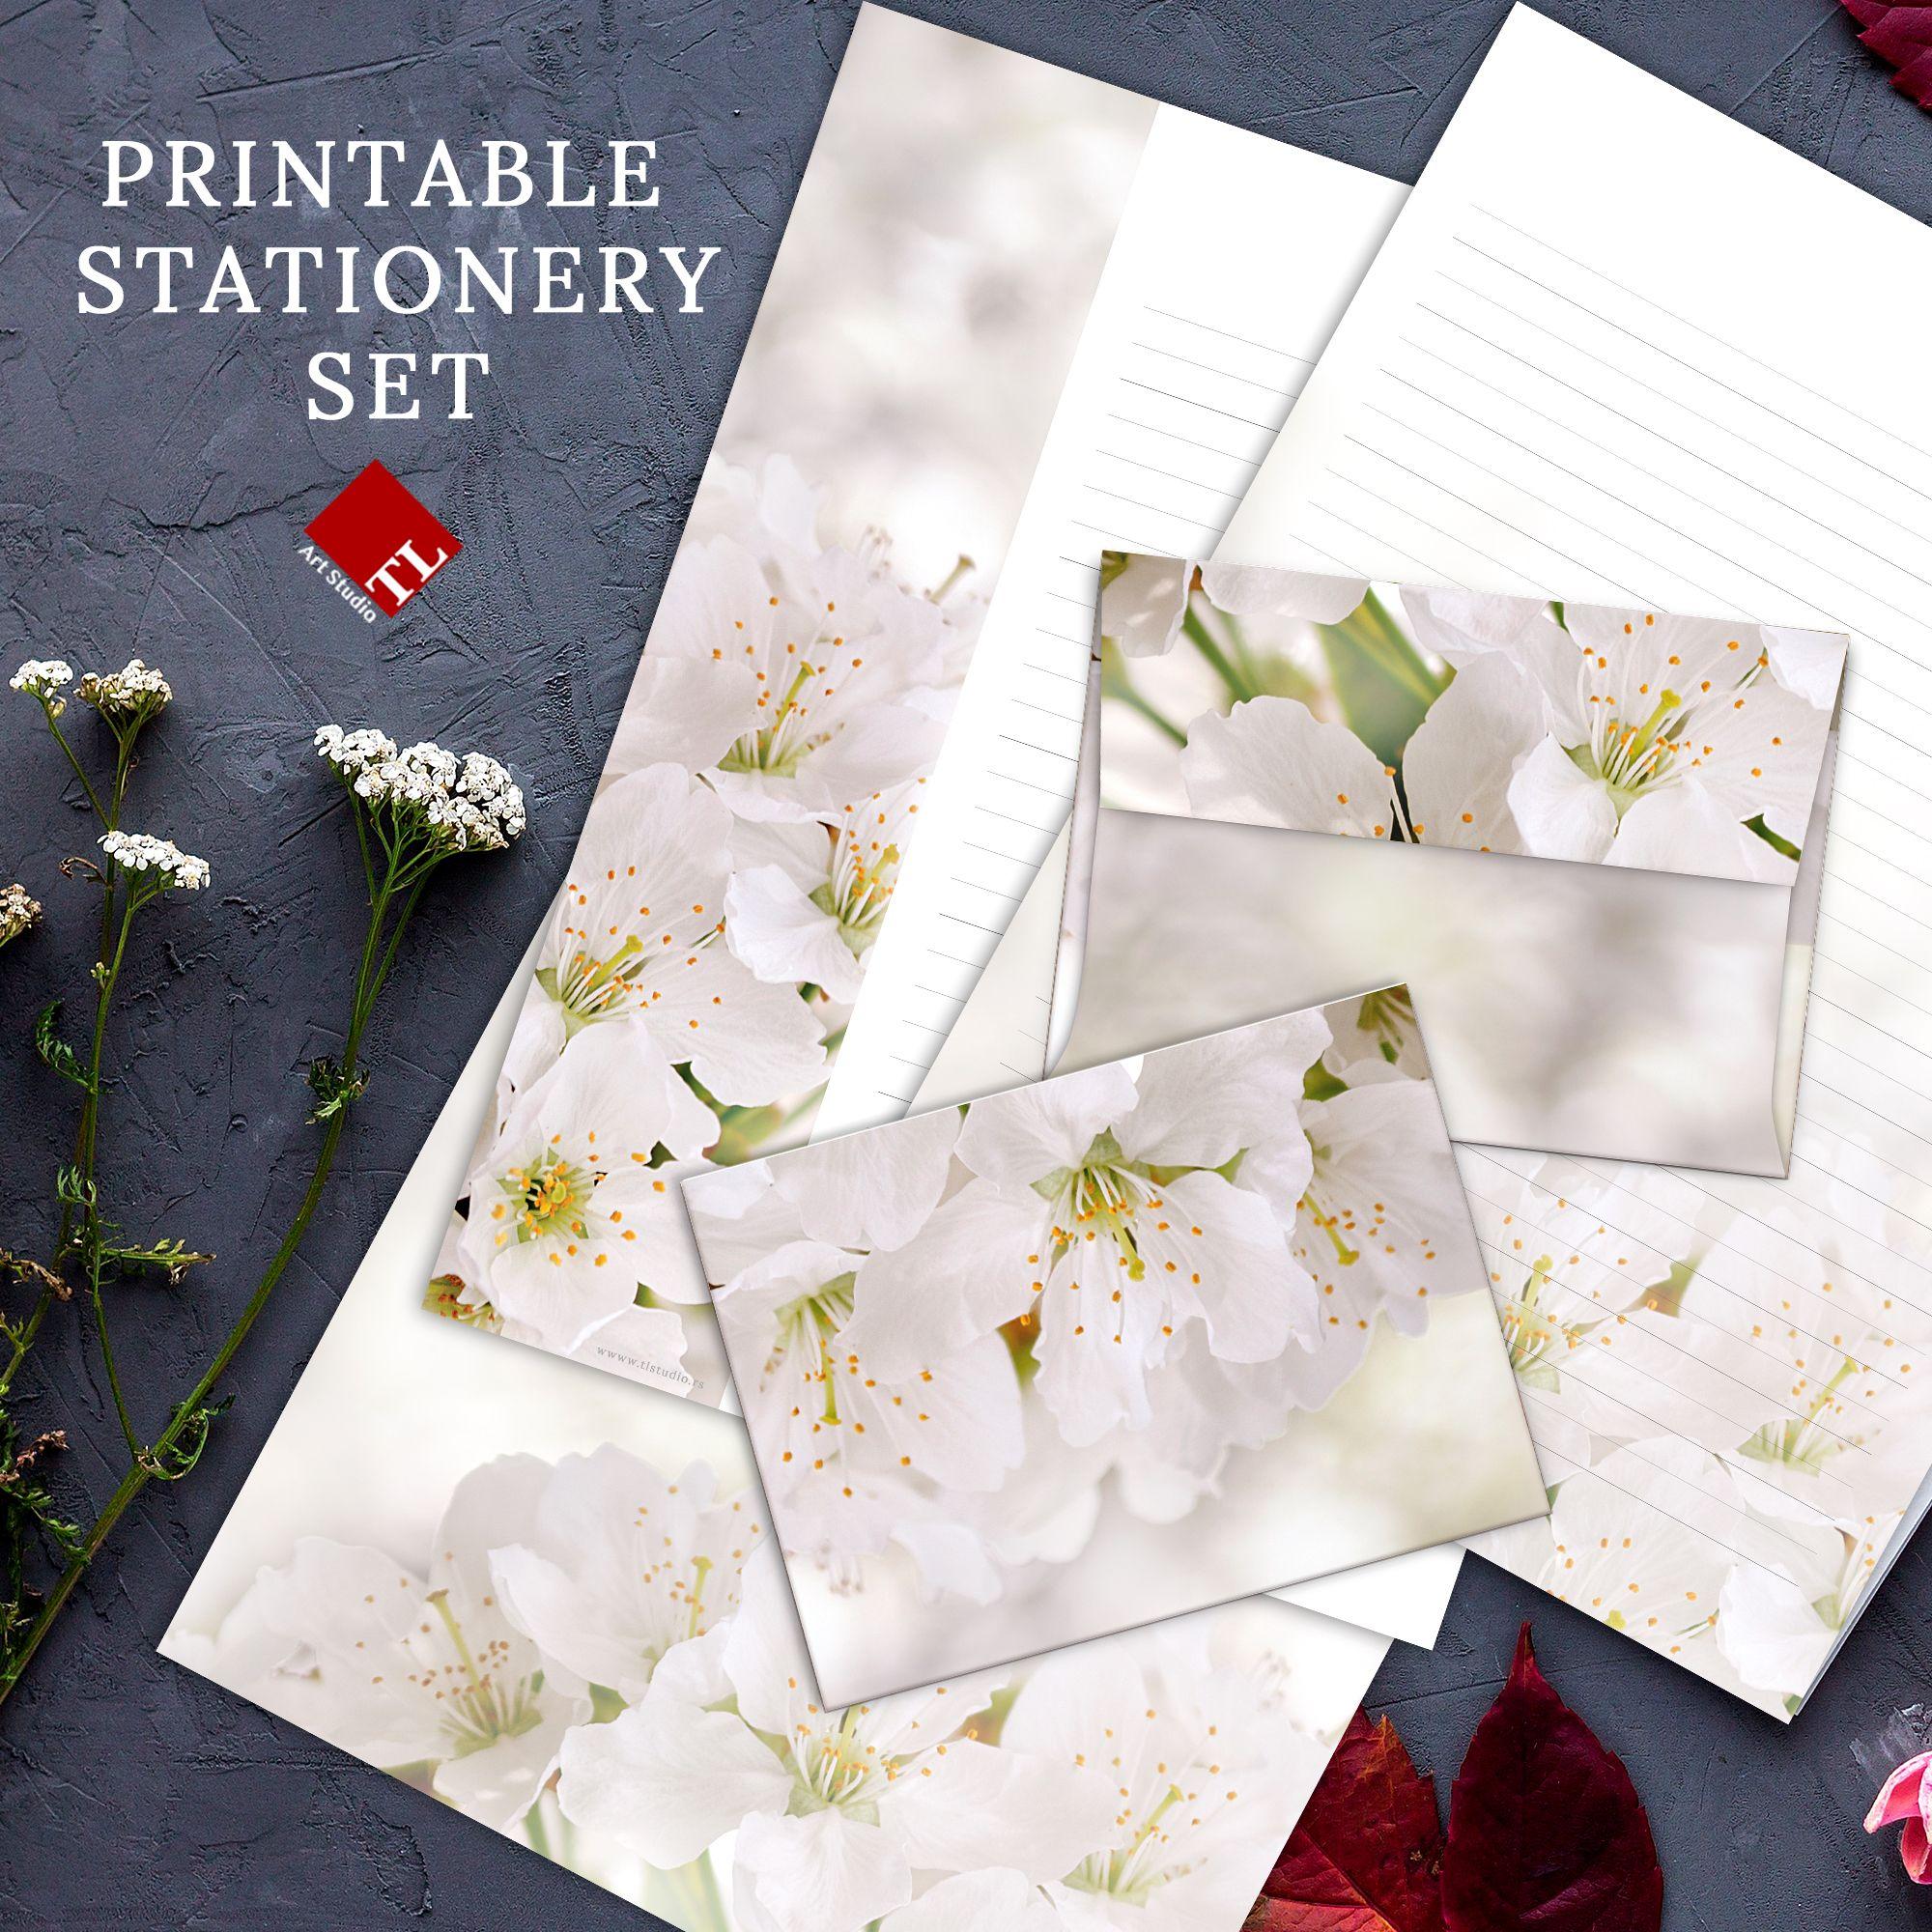 Cherry Blossom Printable Stationery Set White Flowers Etsy Printable Stationery Stationery Set Stationery